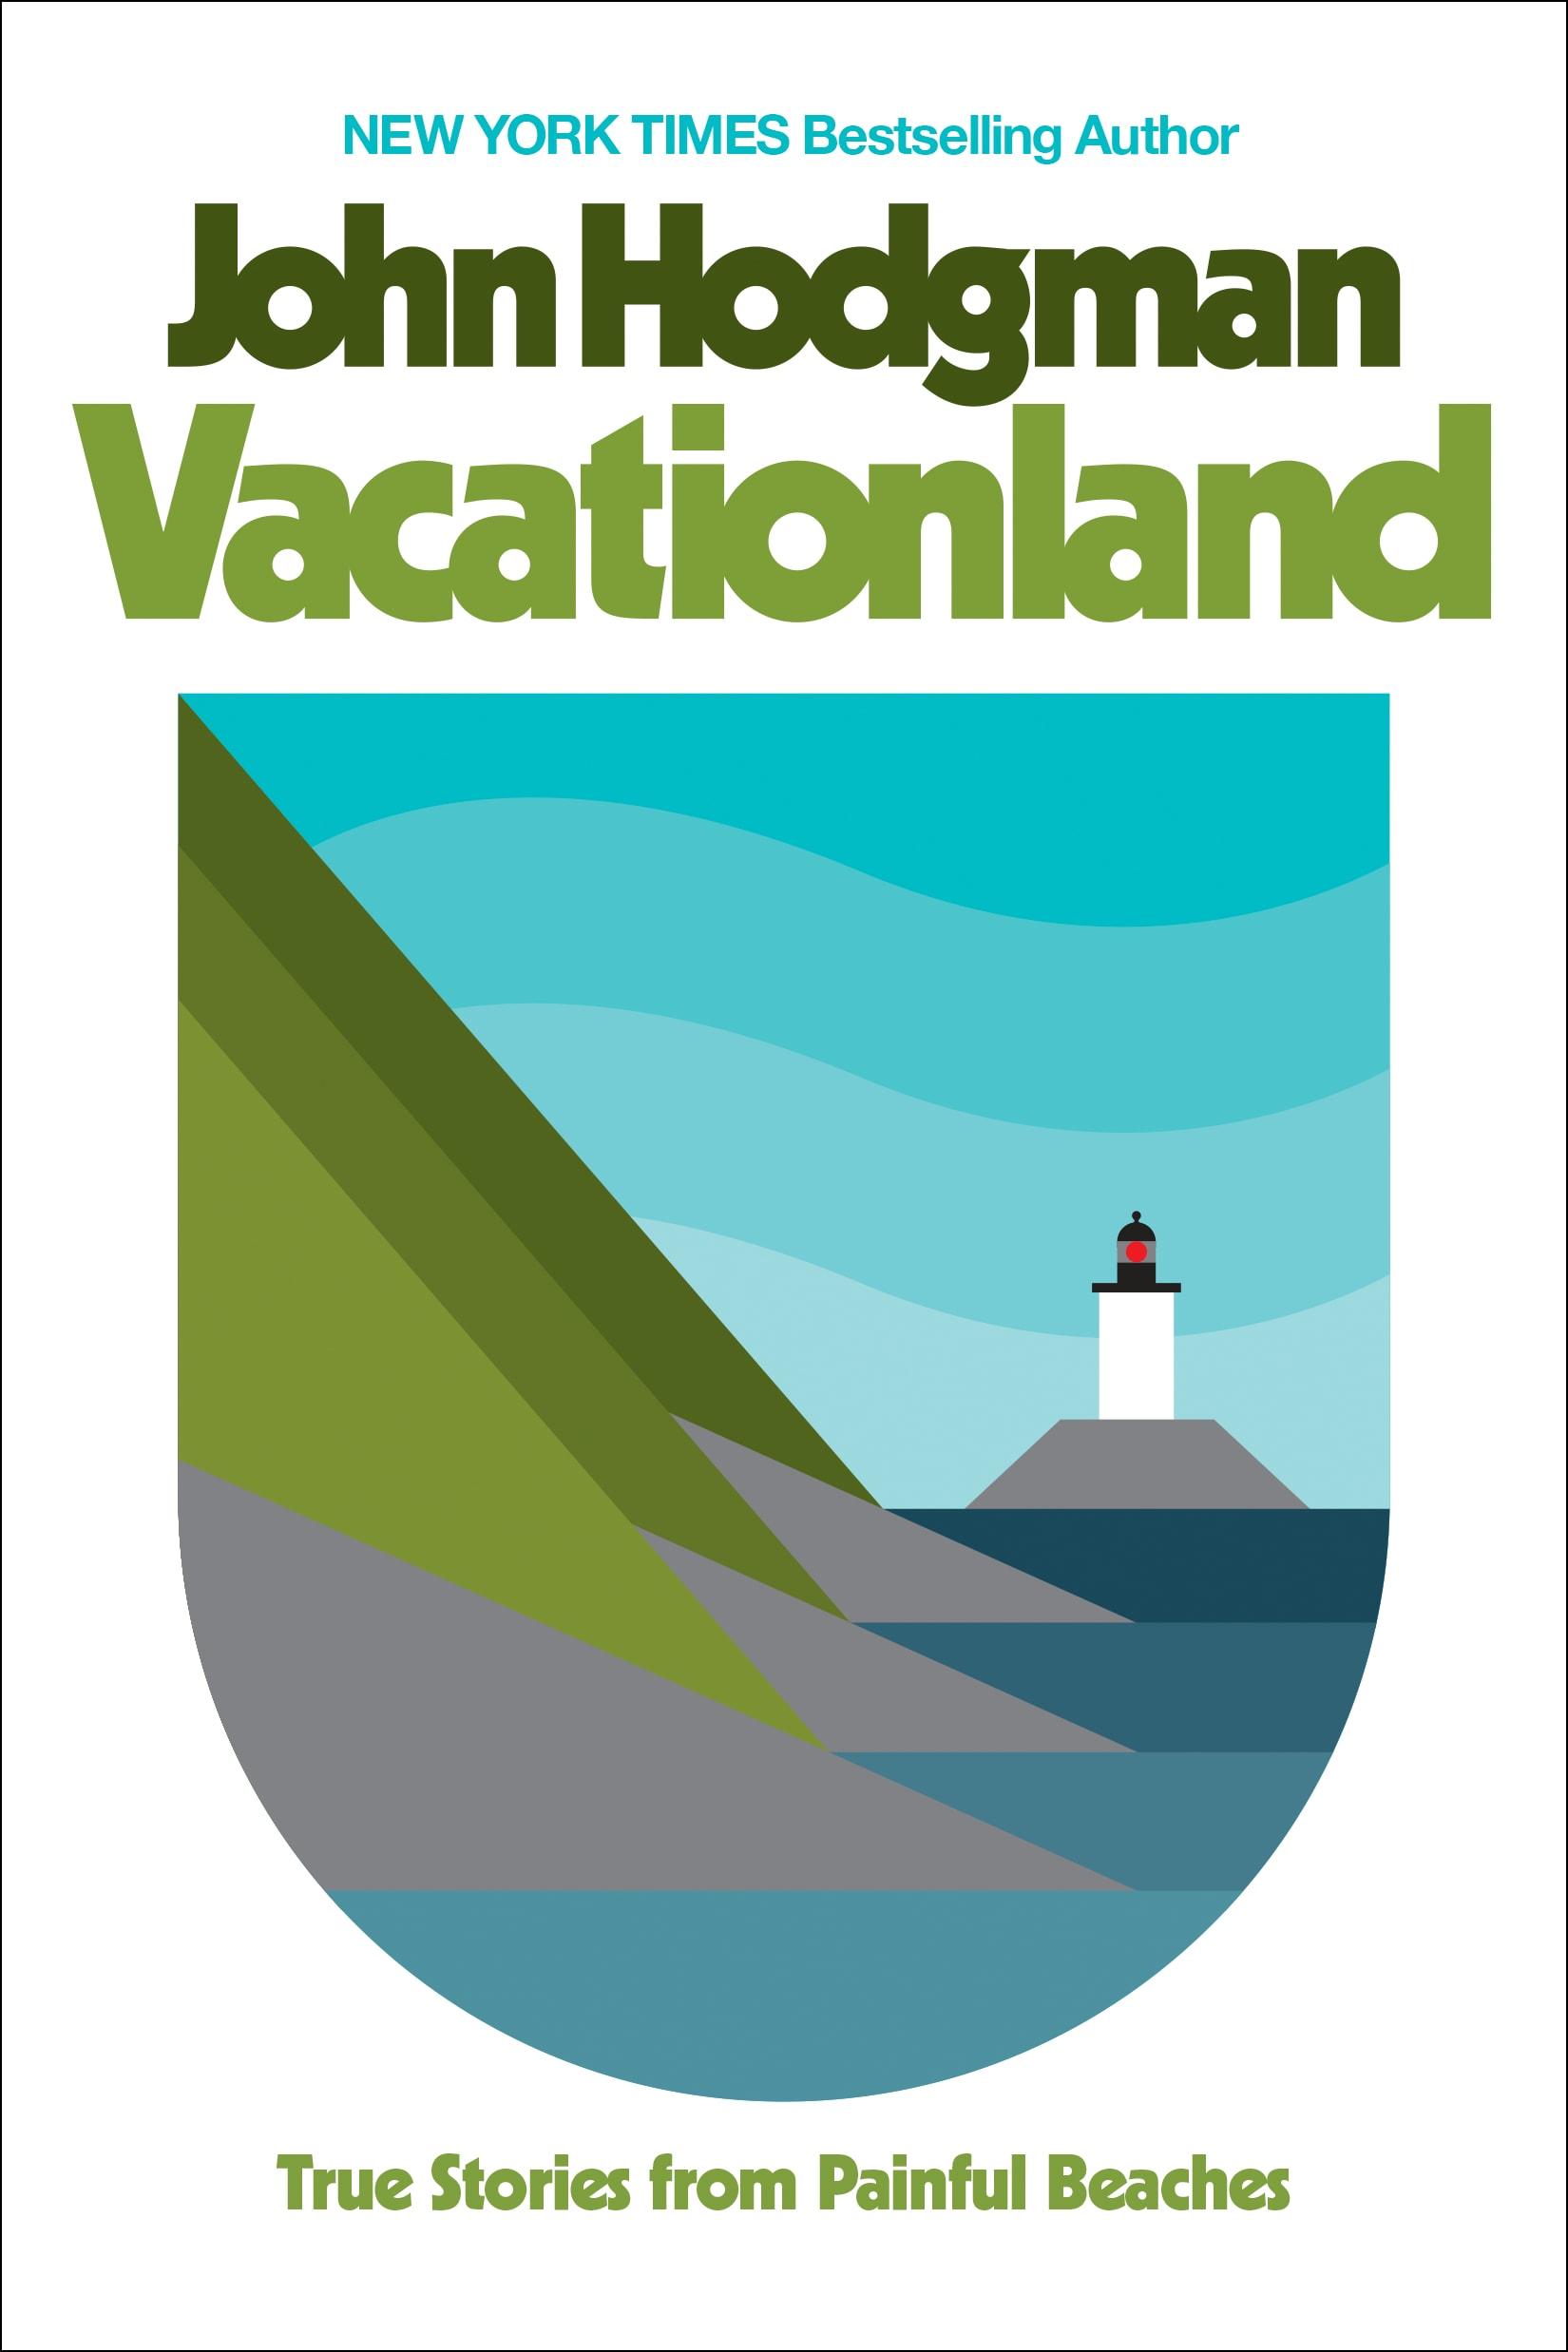 In 'Vacationland,' John Hodgman confronts surrealism of adult life